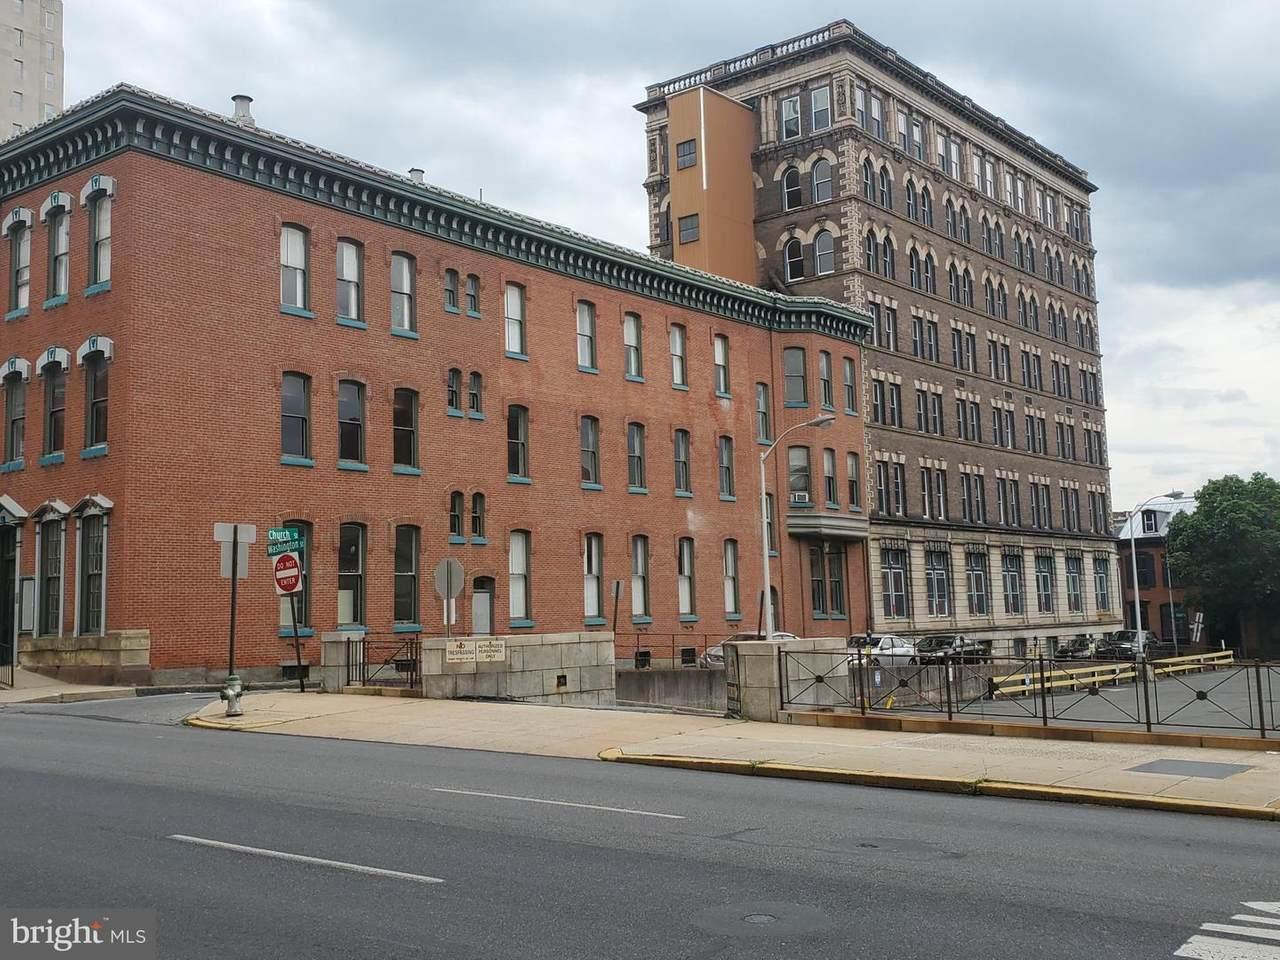 527 Court Street - Photo 1